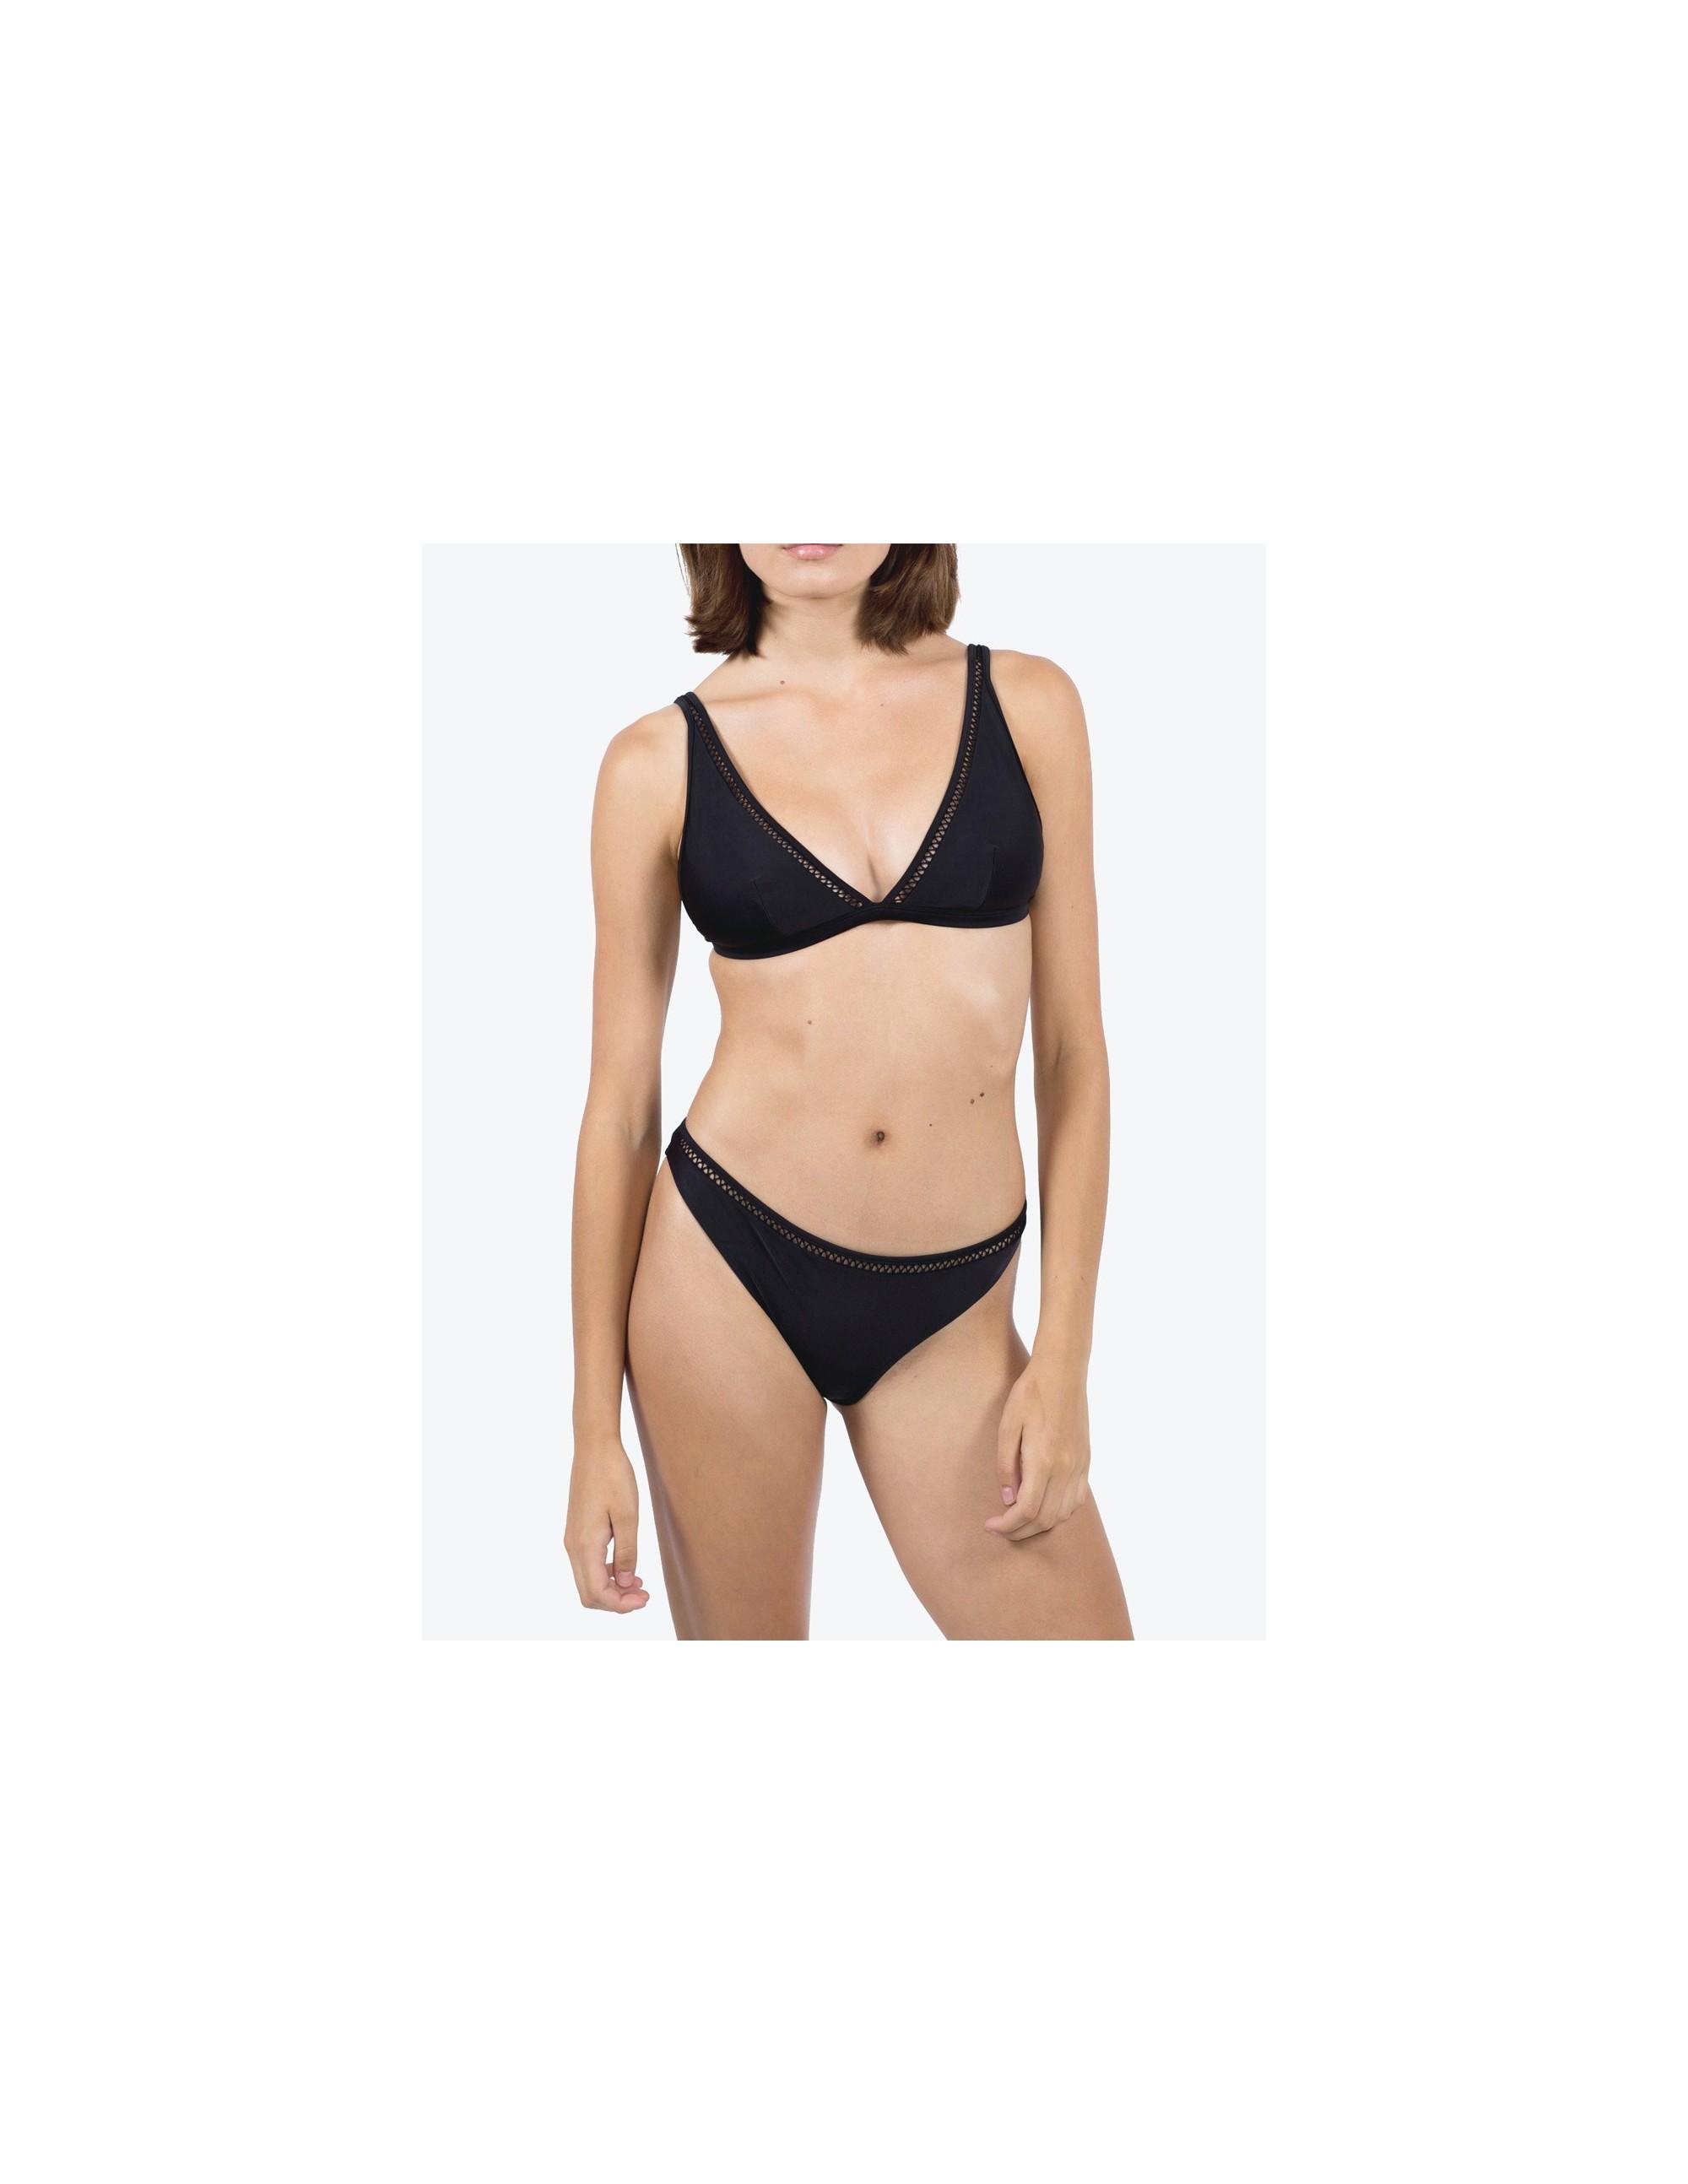 BELLA bikini bottom - MATTE BLACK